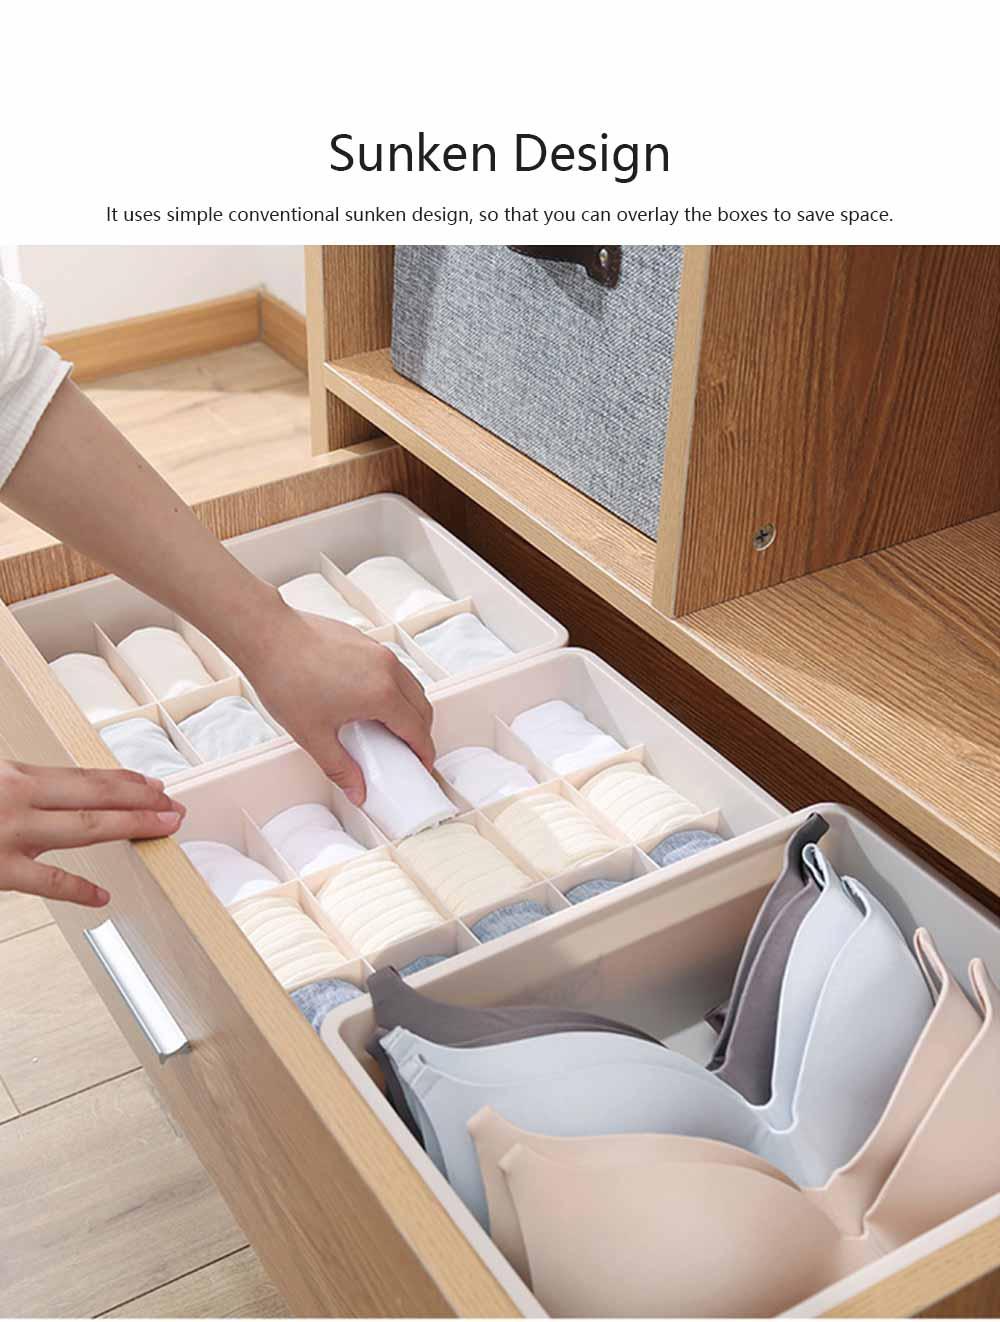 Compartmentalized Storage Boxes Higher Bottom Sunken Design Concise Style Underwear Bra and Socks Storage Cases 4